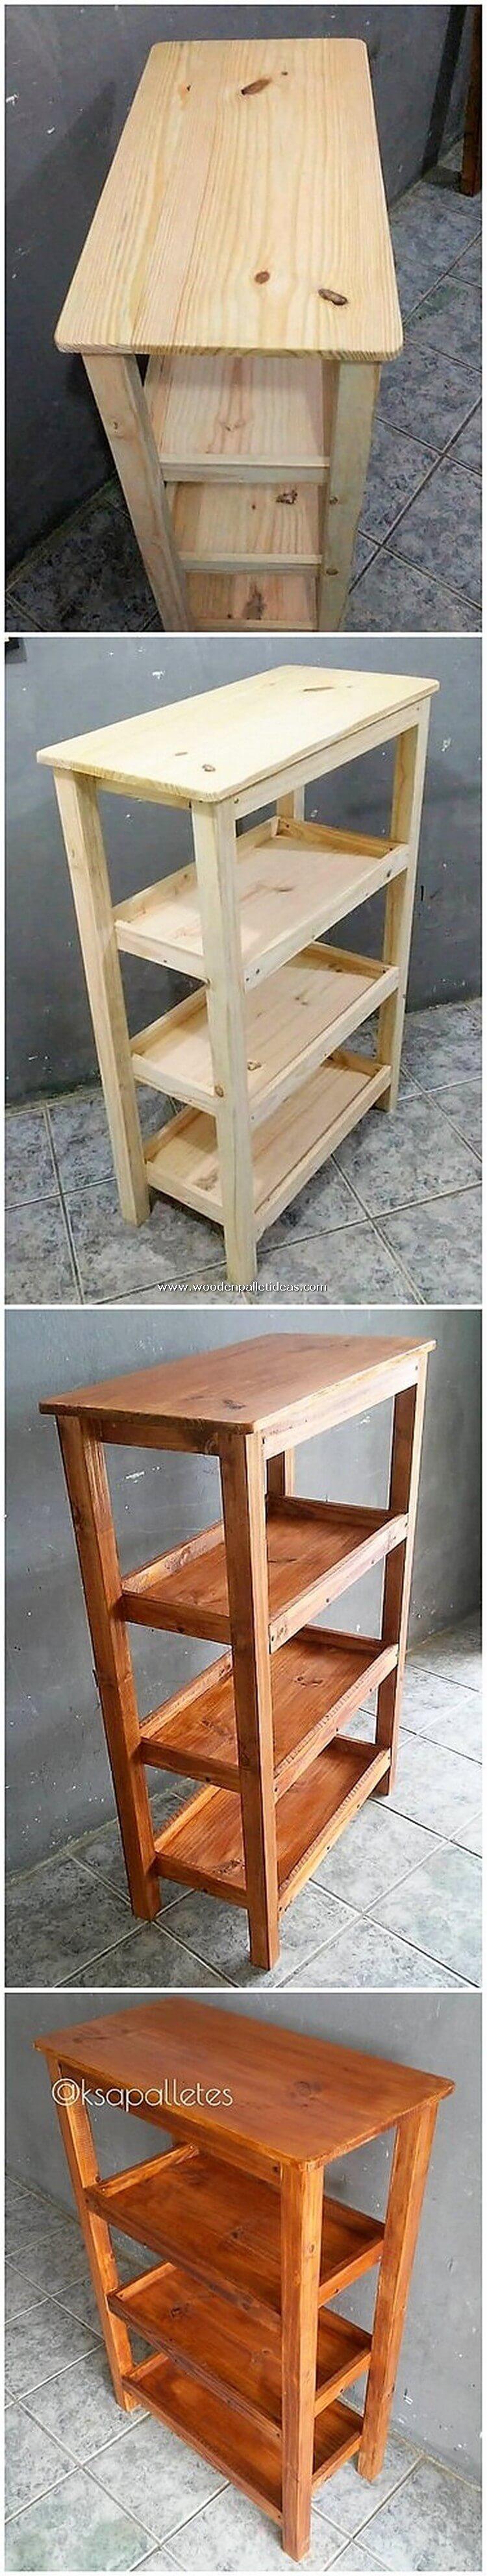 DIY-Pallet-Shelving-TAble